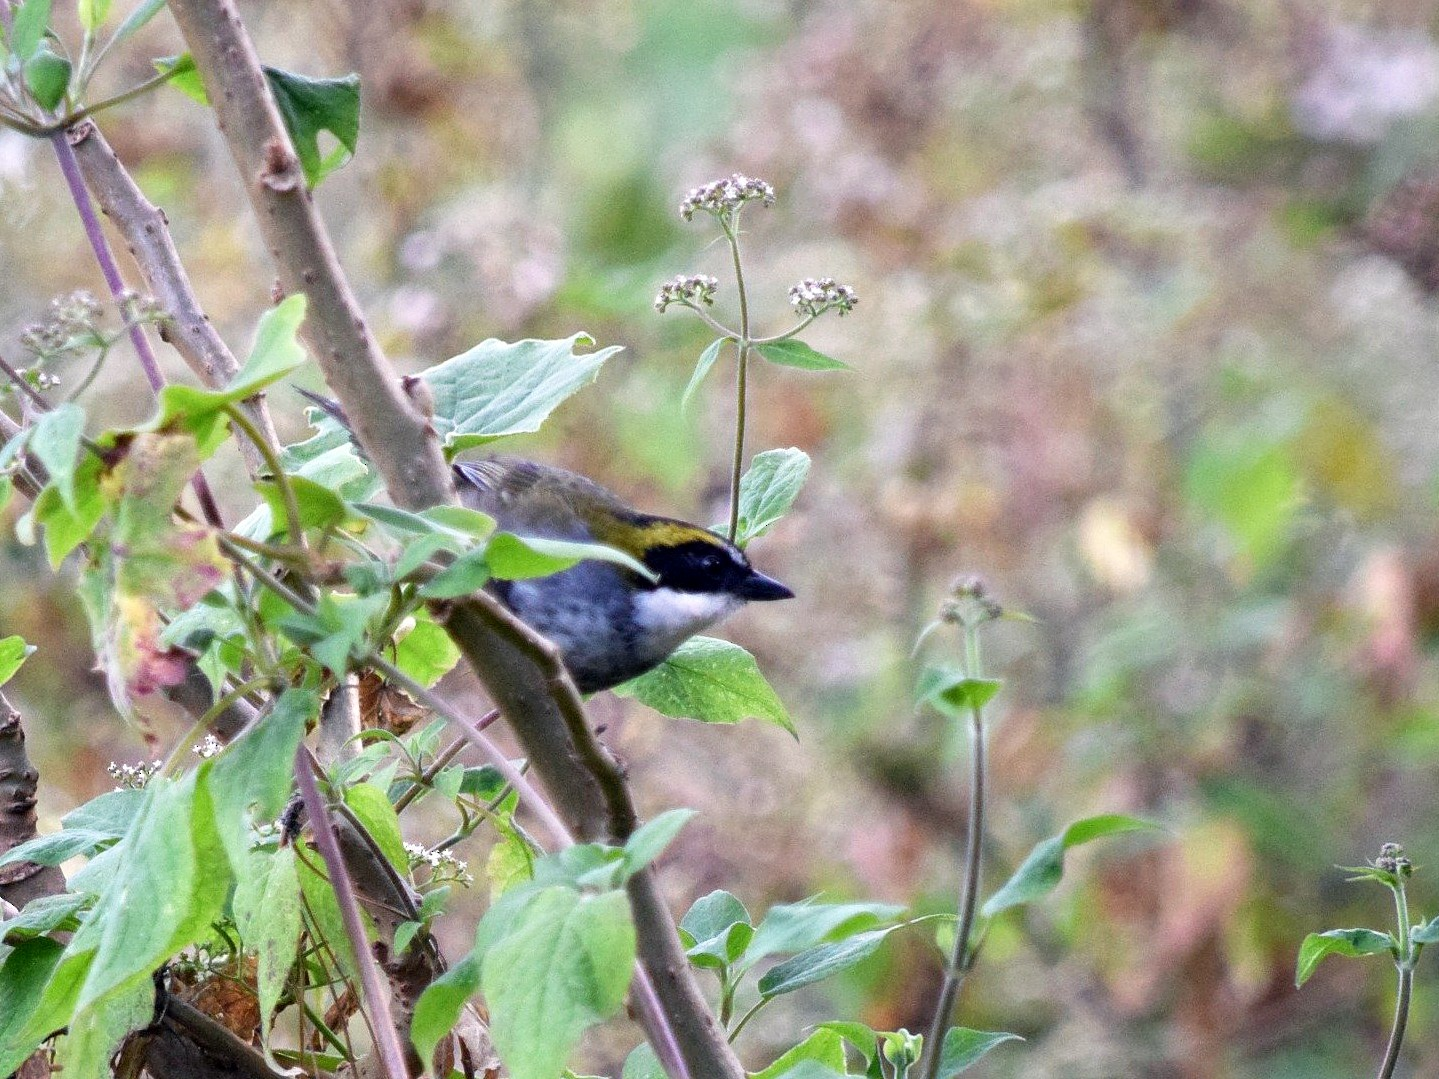 Green-striped Brushfinch - Raúl Caballero (Mexihca Aves)